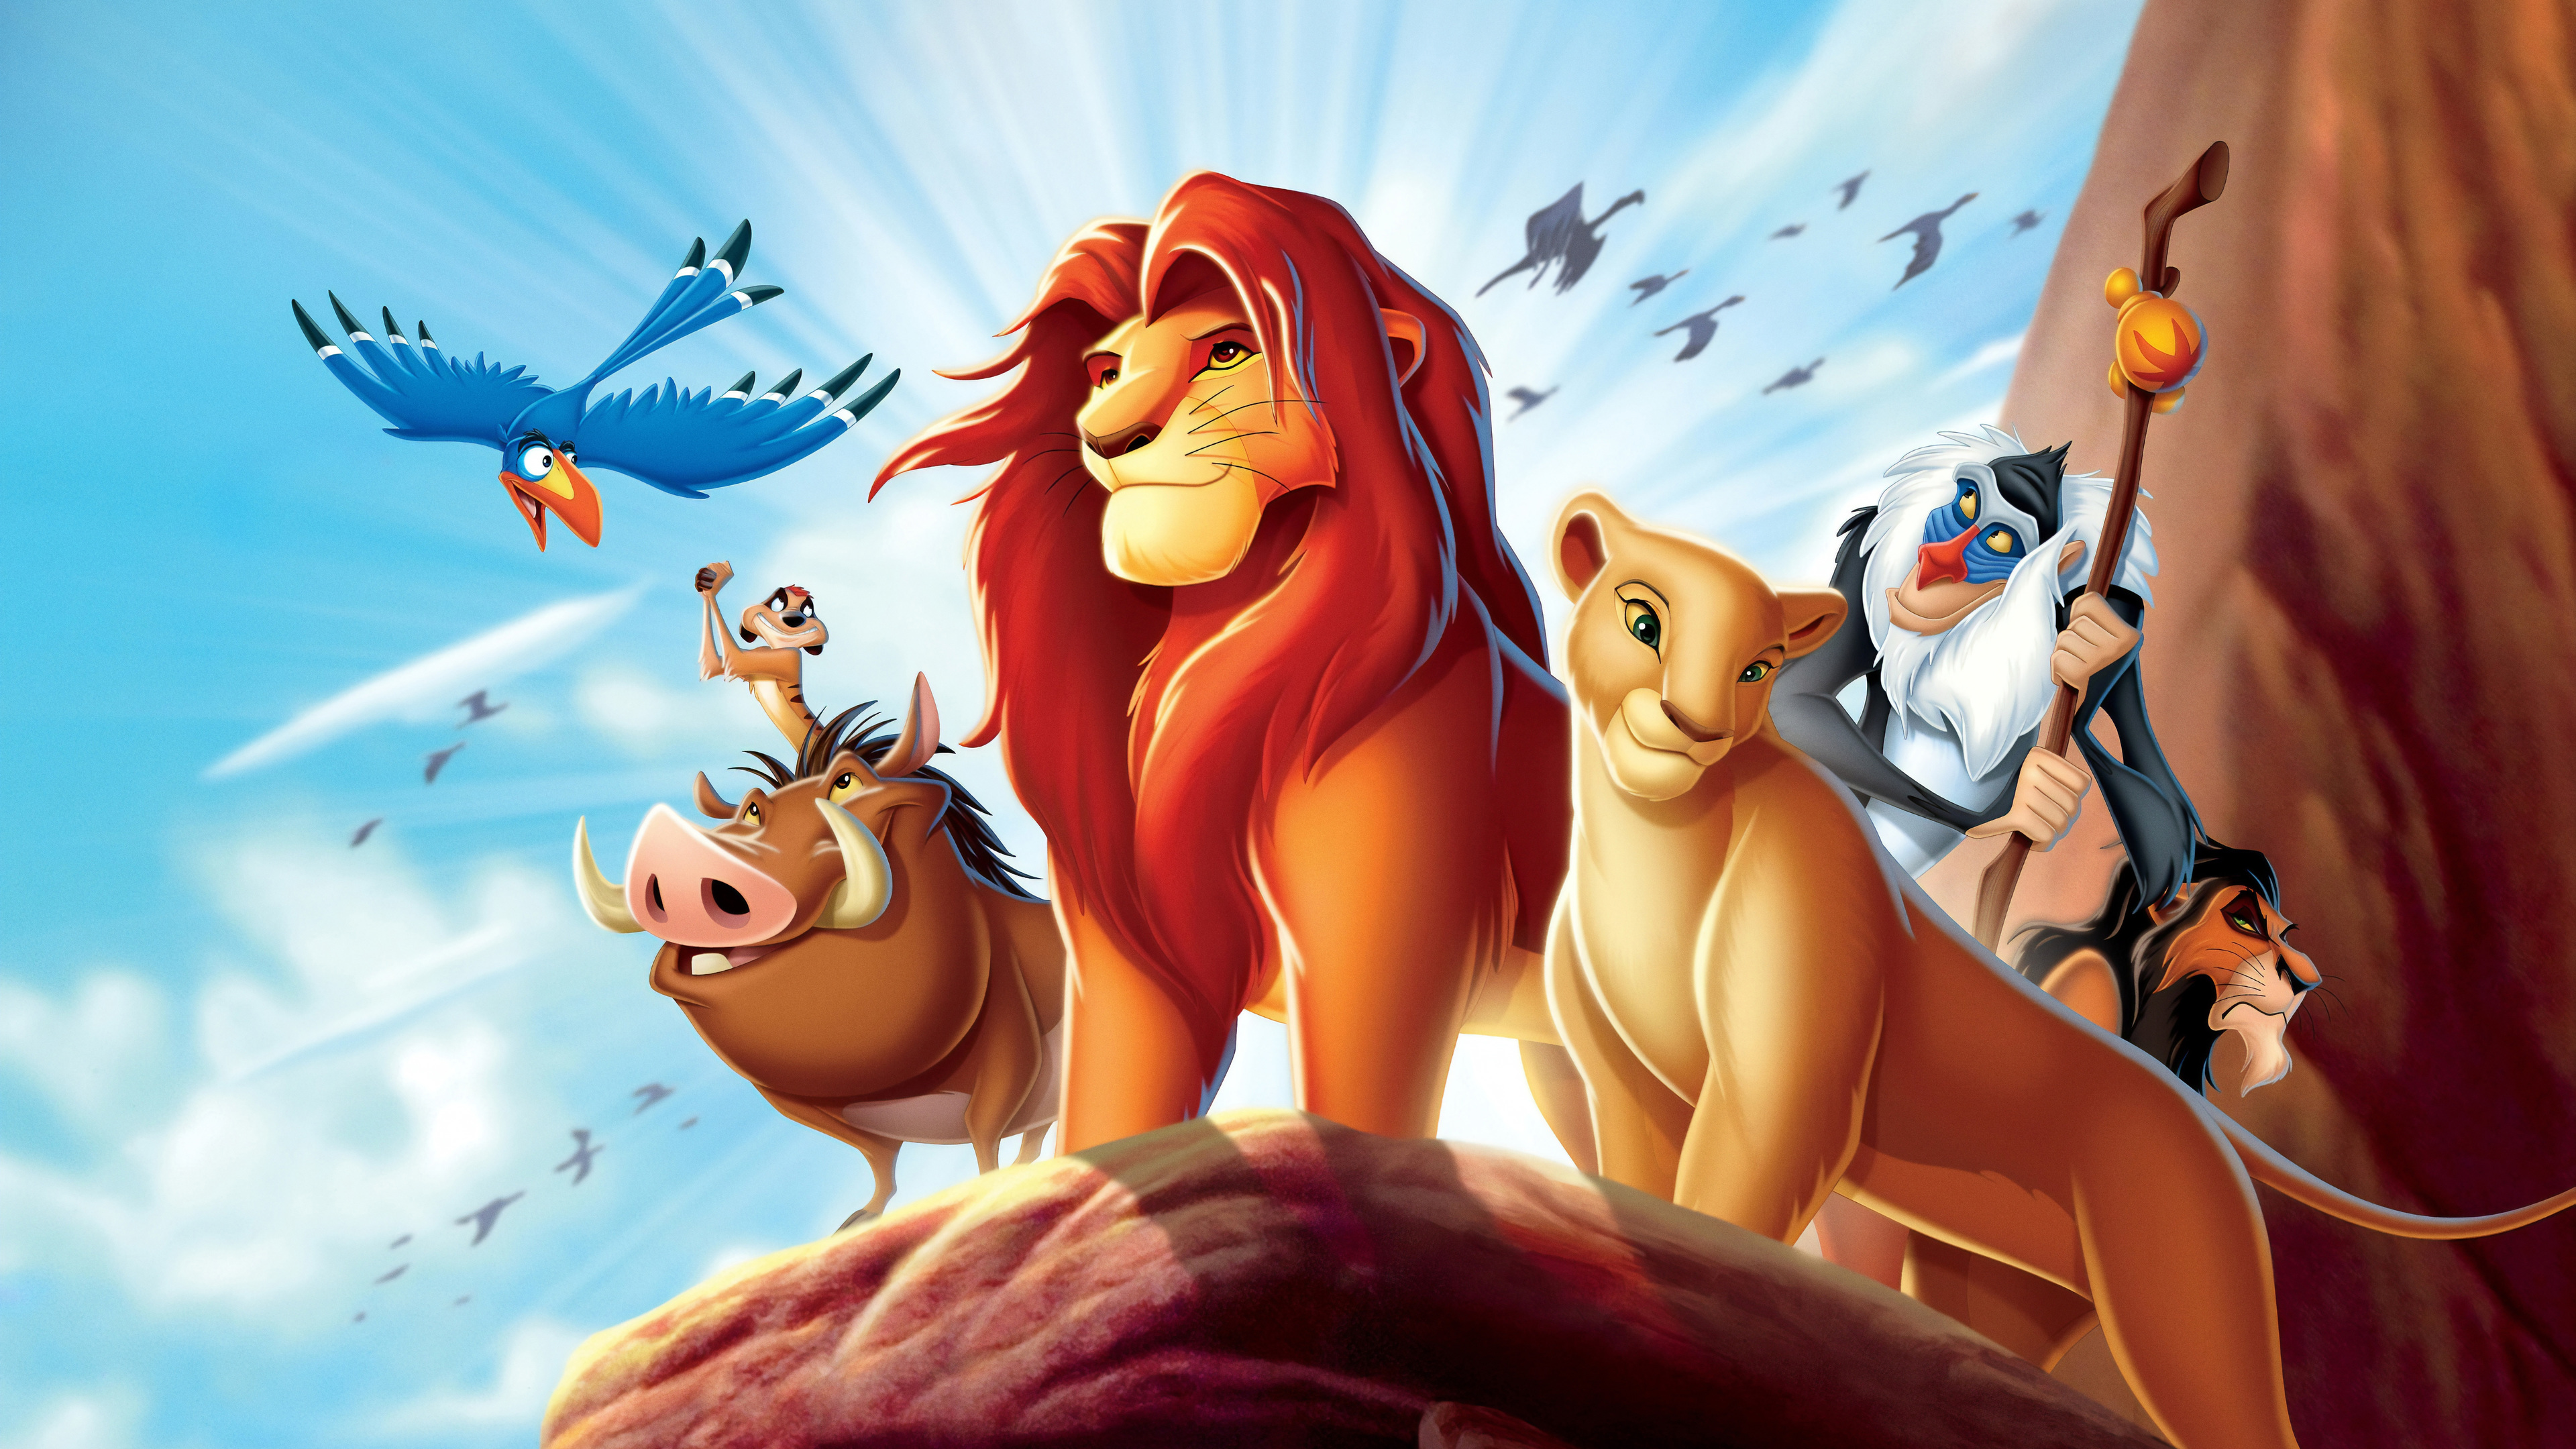 lion king 1994 4k 1544286388 - Lion King 1994 4k - the lion king wallpapers, simba wallpapers, movies wallpapers, lion wallpapers, hd-wallpapers, disney wallpapers, deviantart wallpapers, 4k-wallpapers